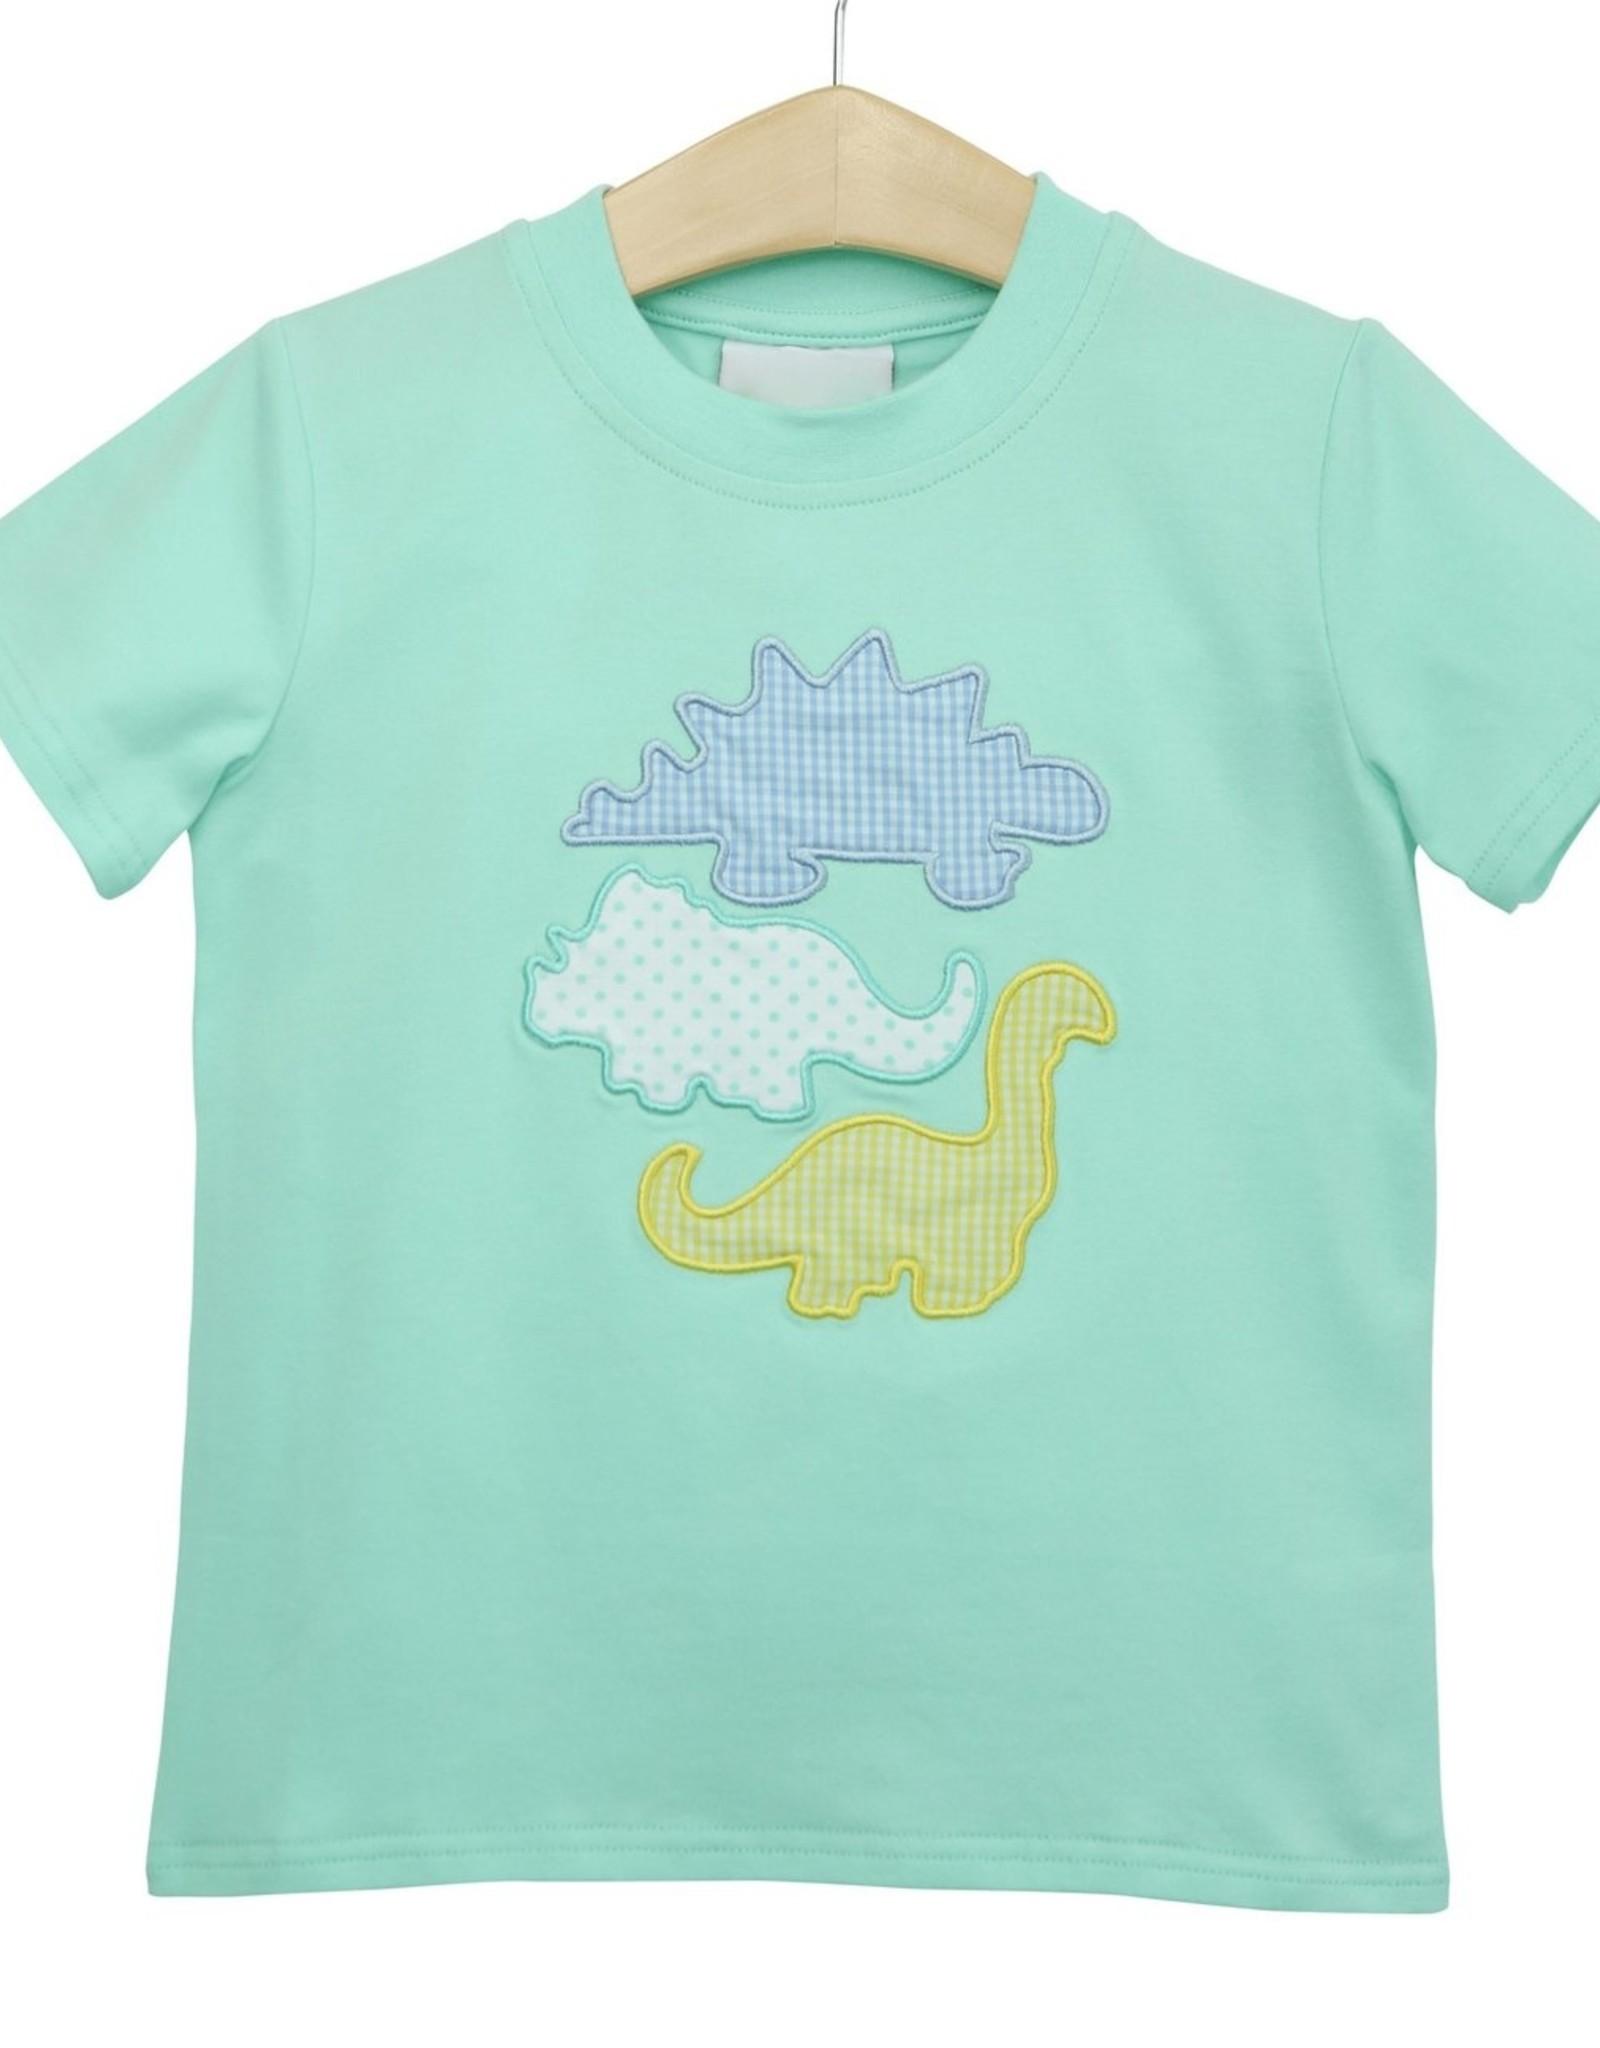 Trotter Street Kids Dinosaur Boys Shirt